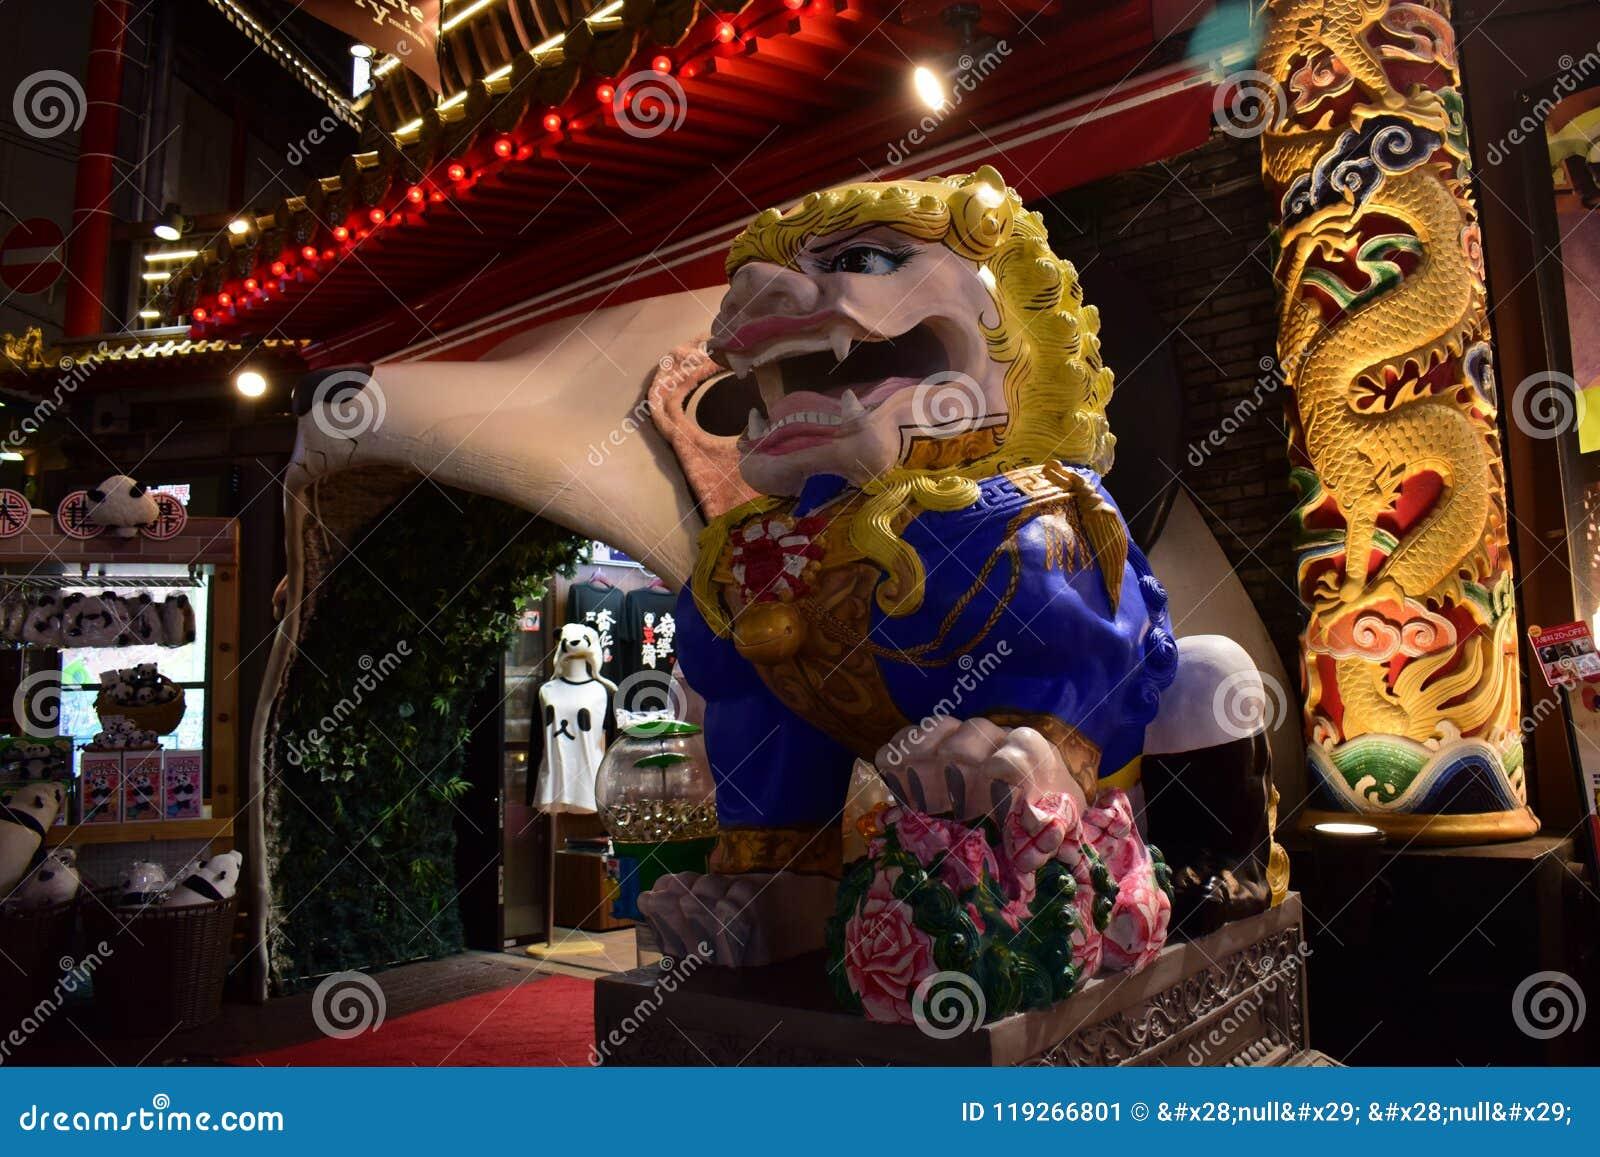 Japan Yokohama Chinatown night view, cute Lion statue